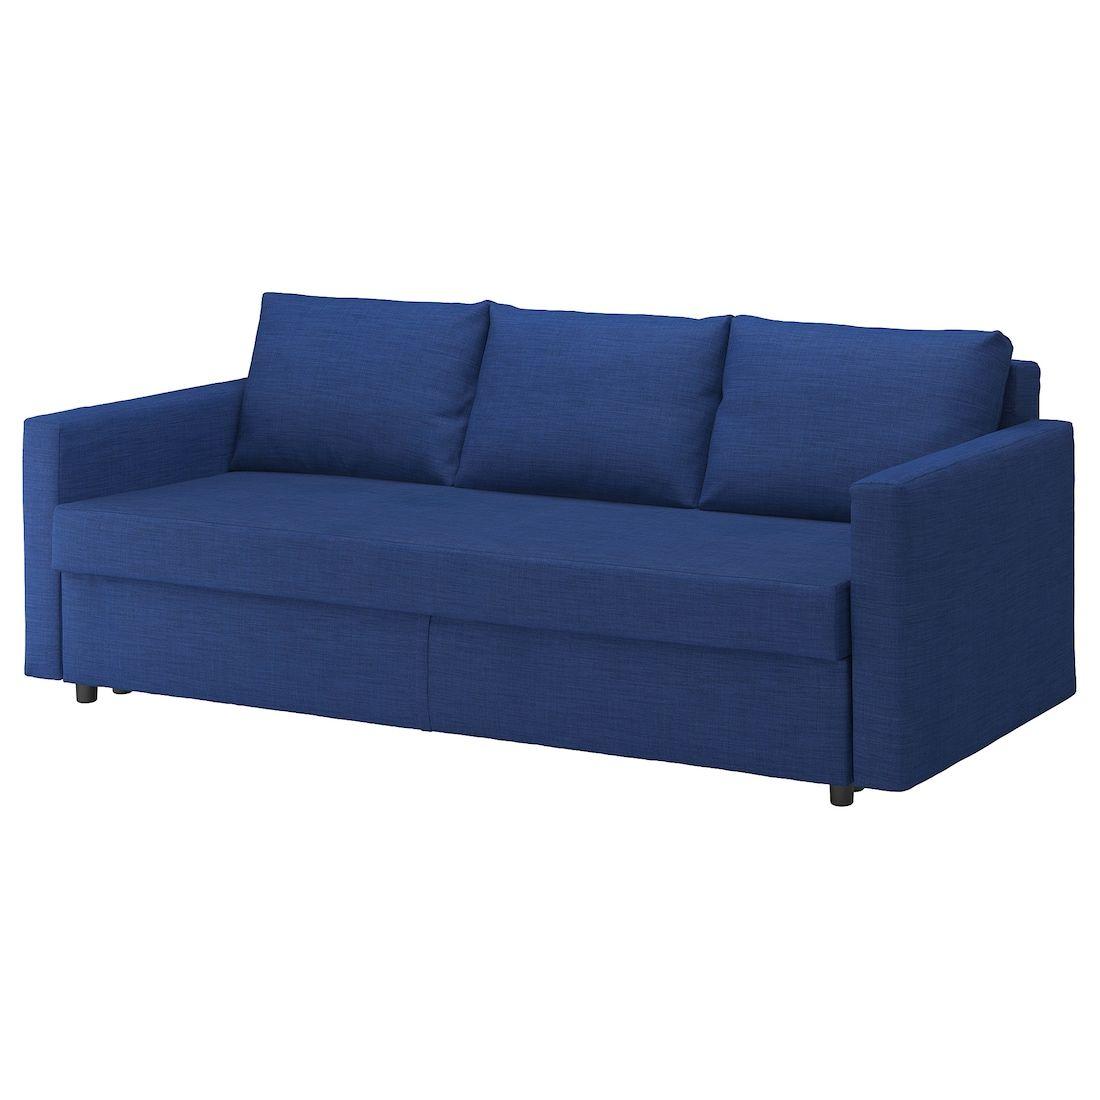 Ikea Friheten Skiftebo Blue Sleeper Sofa In 2020 Cheap Sofa Beds